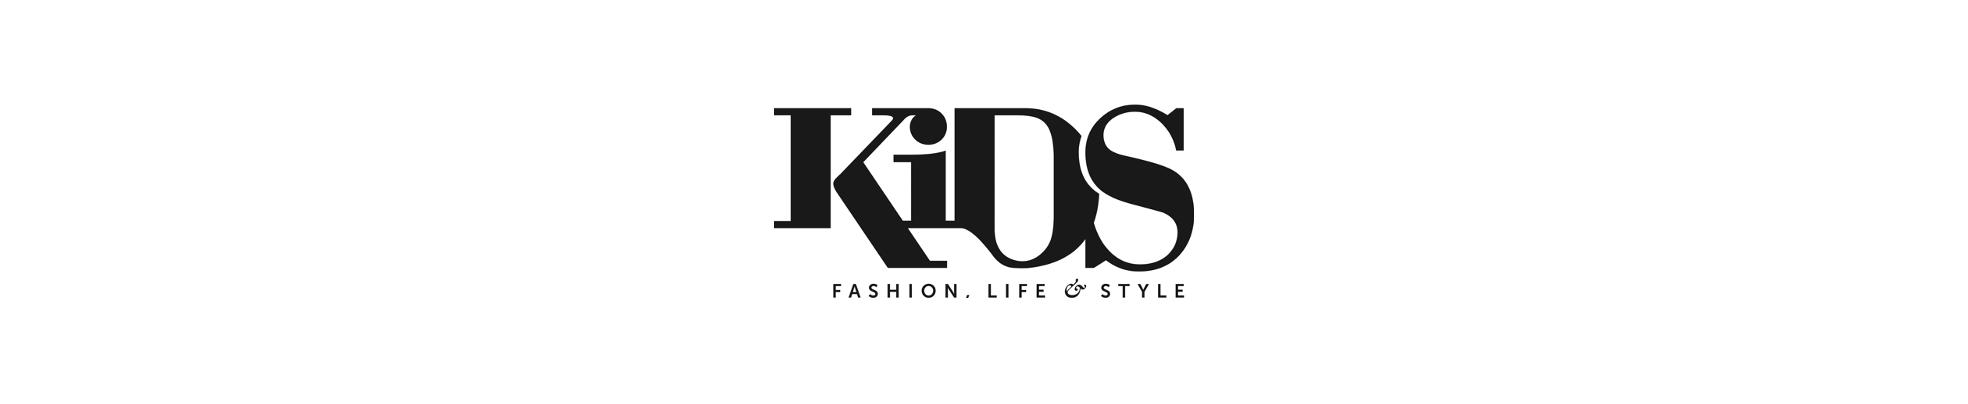 Marelle dans Kids Magazine logo